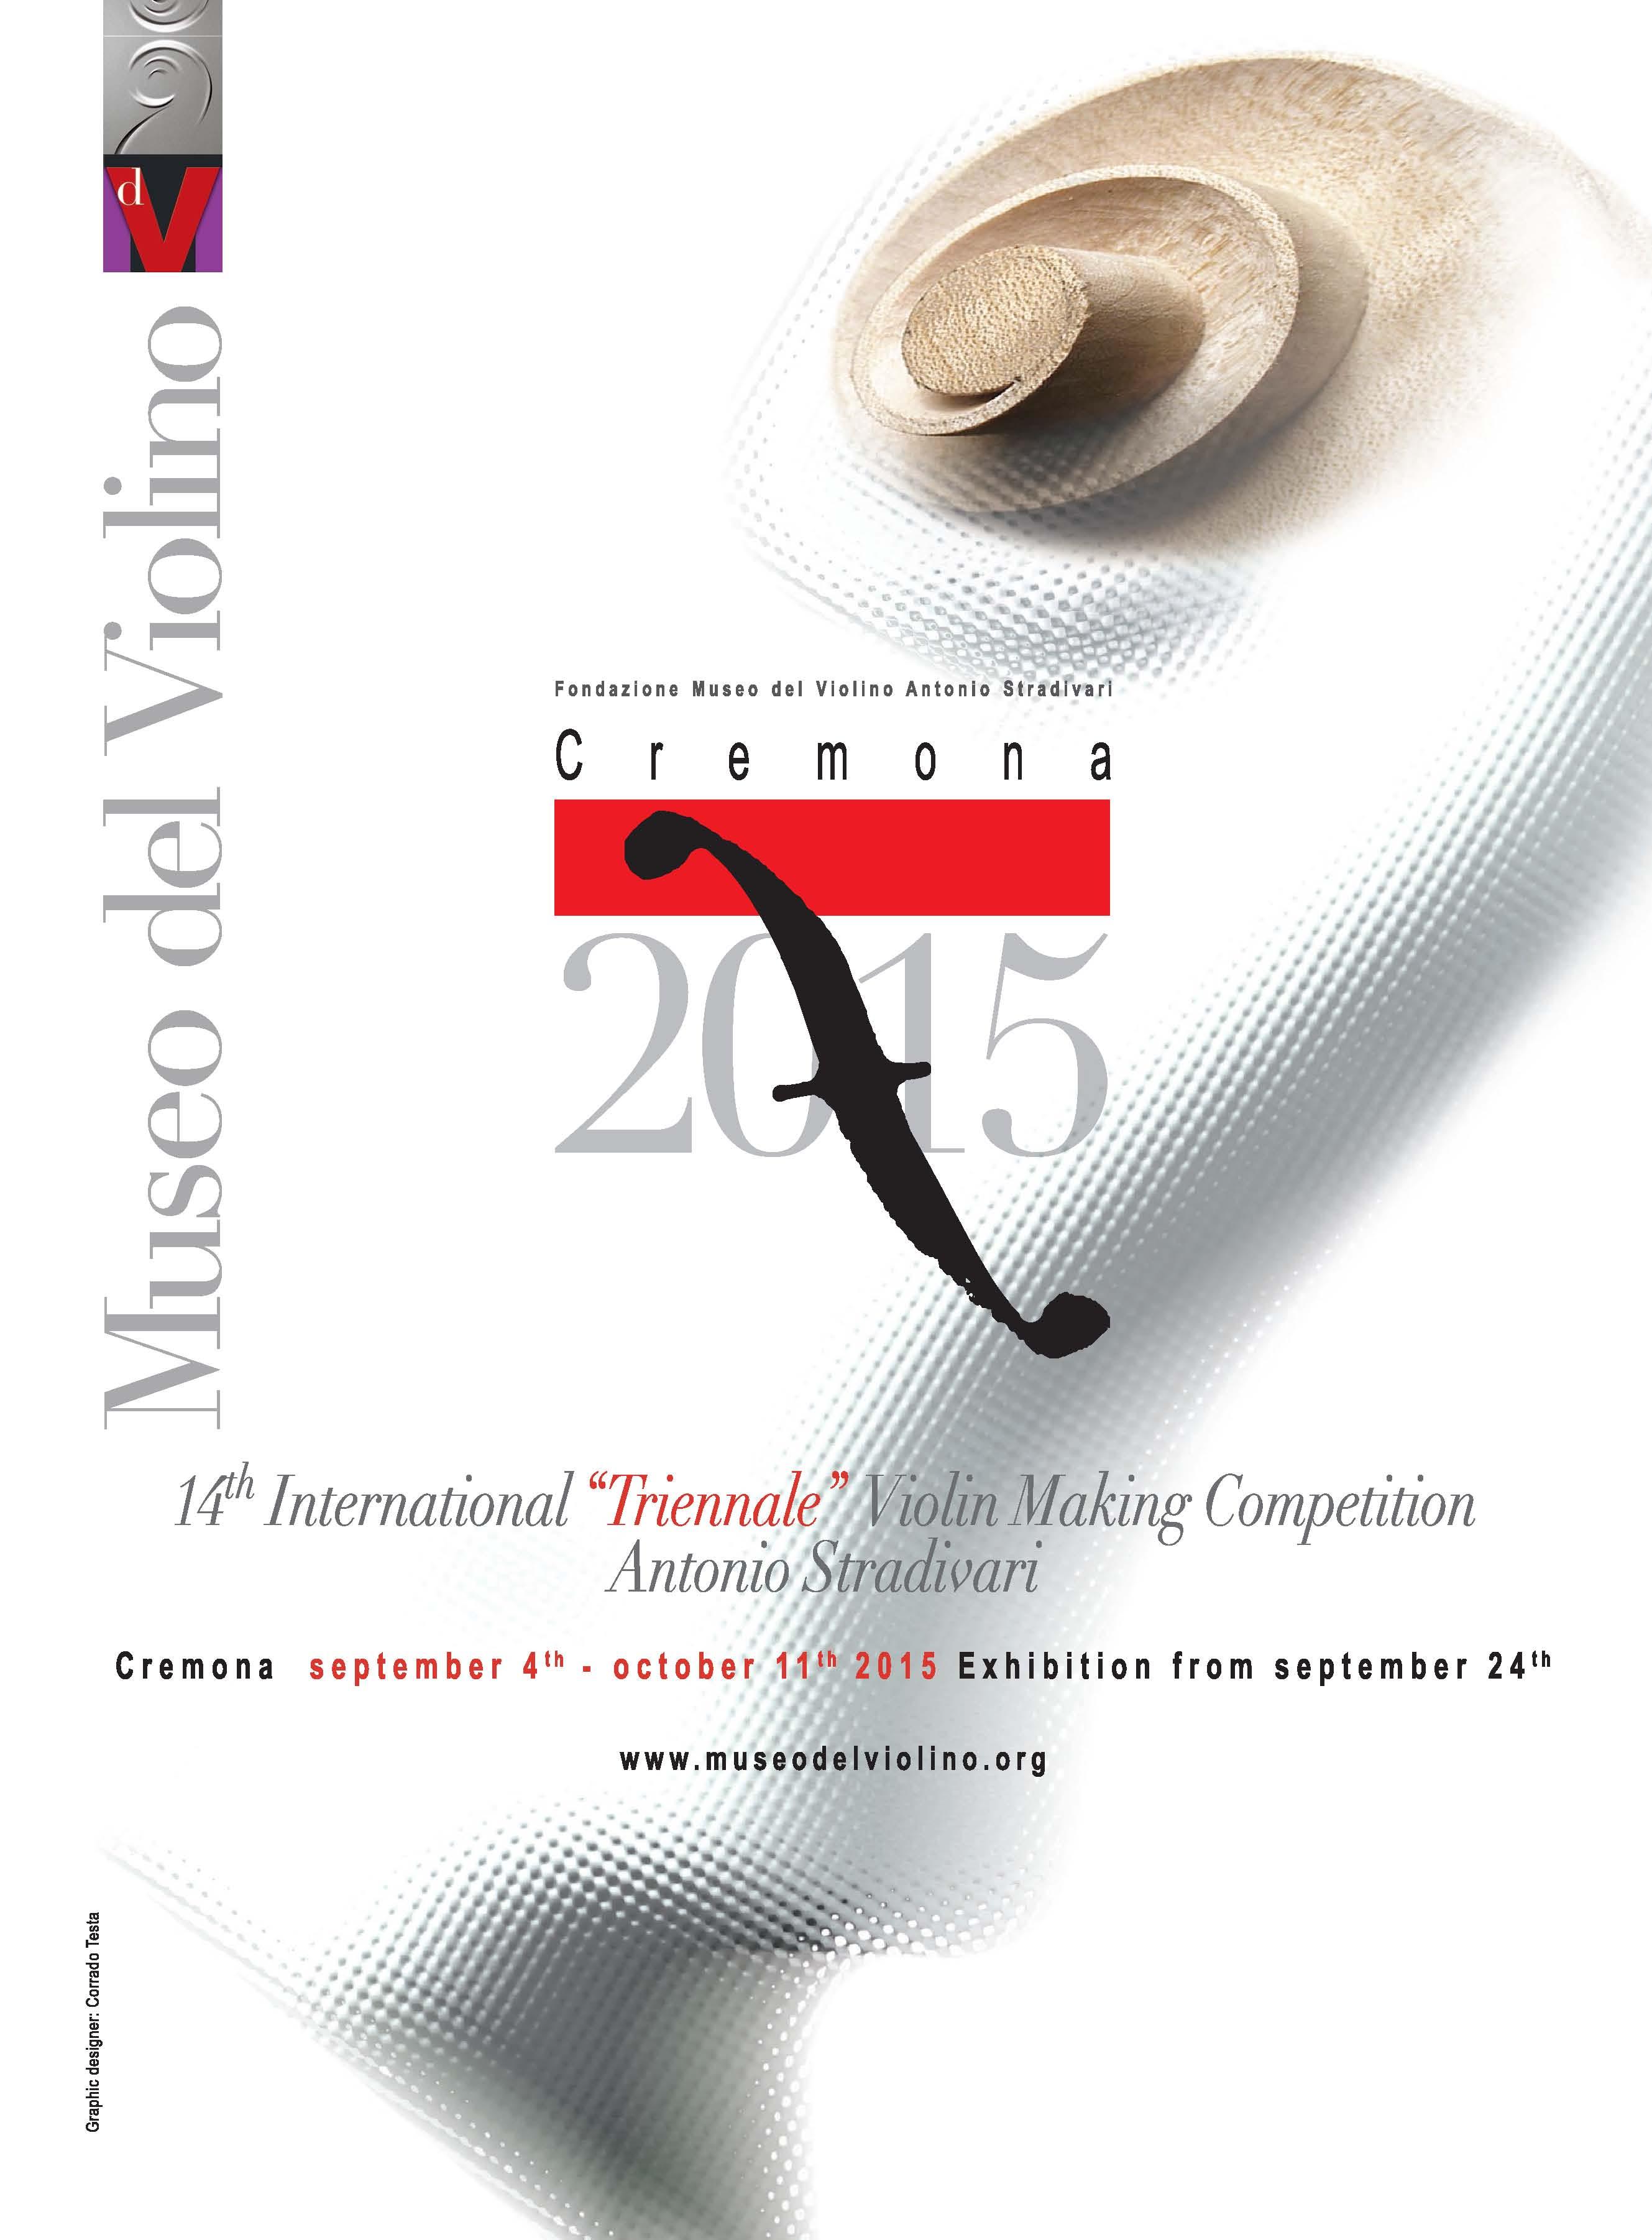 copertina STRAD triennale 215x295 ENG